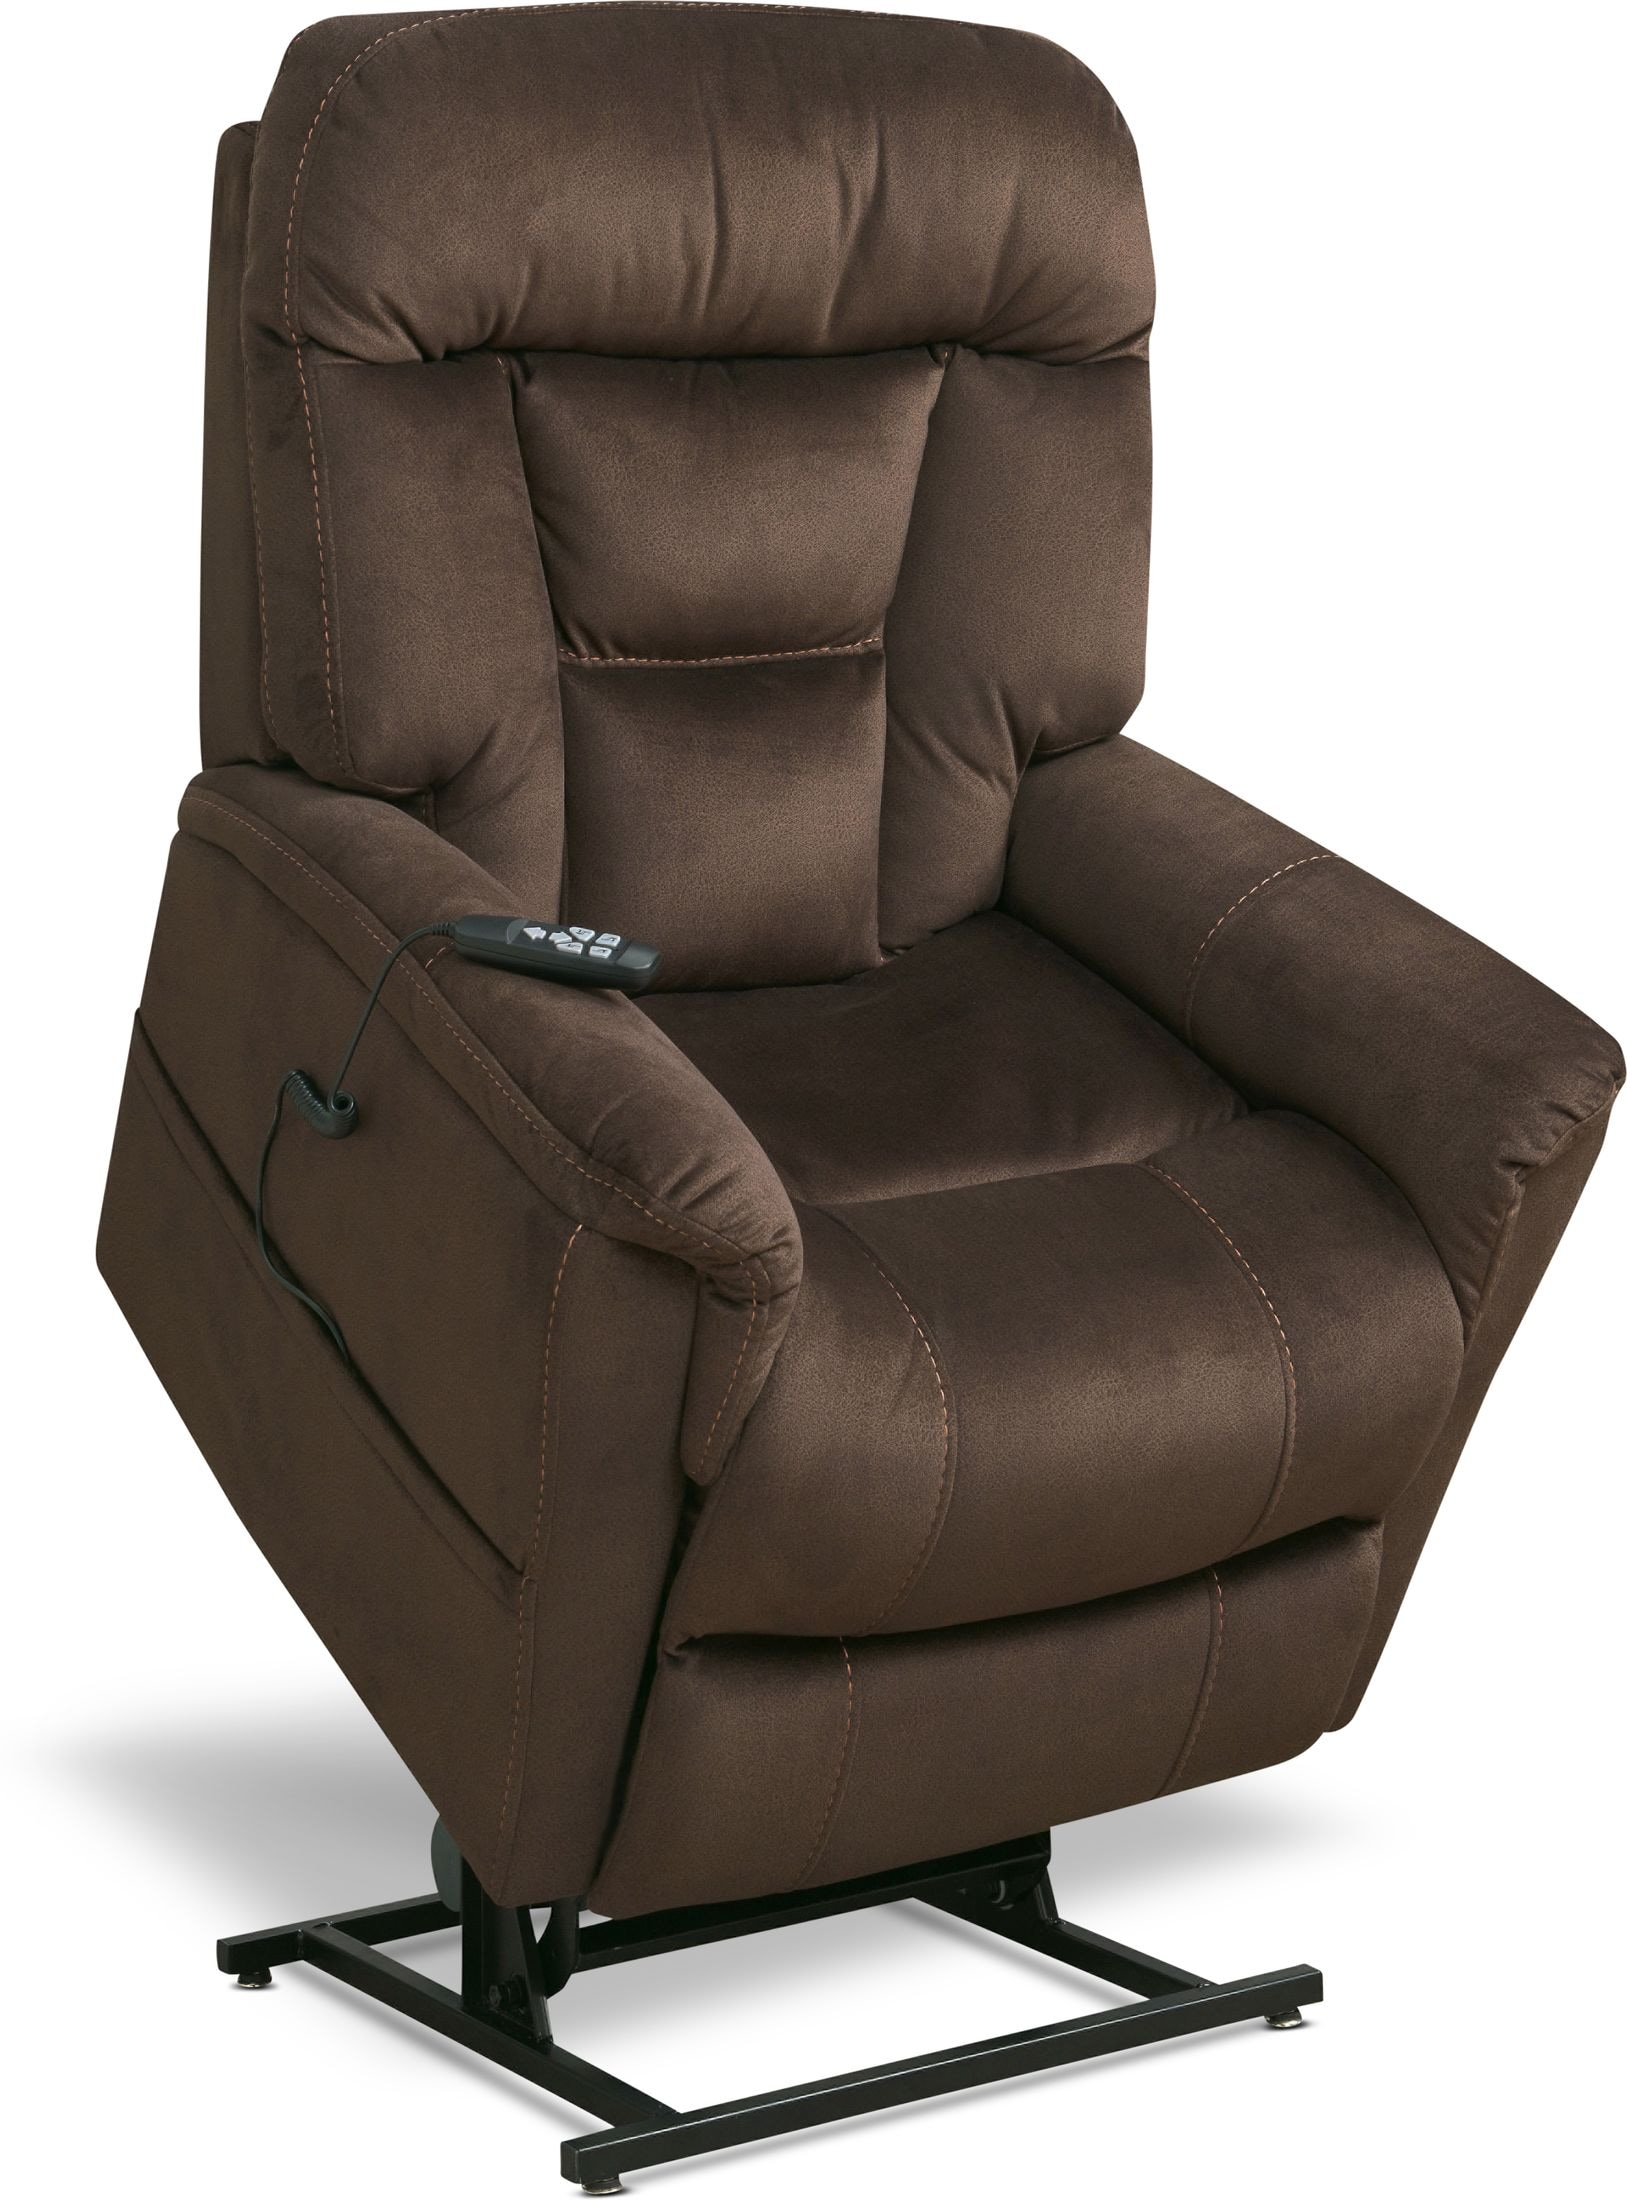 Living Room Furniture - Lagos Power Lift Recliner